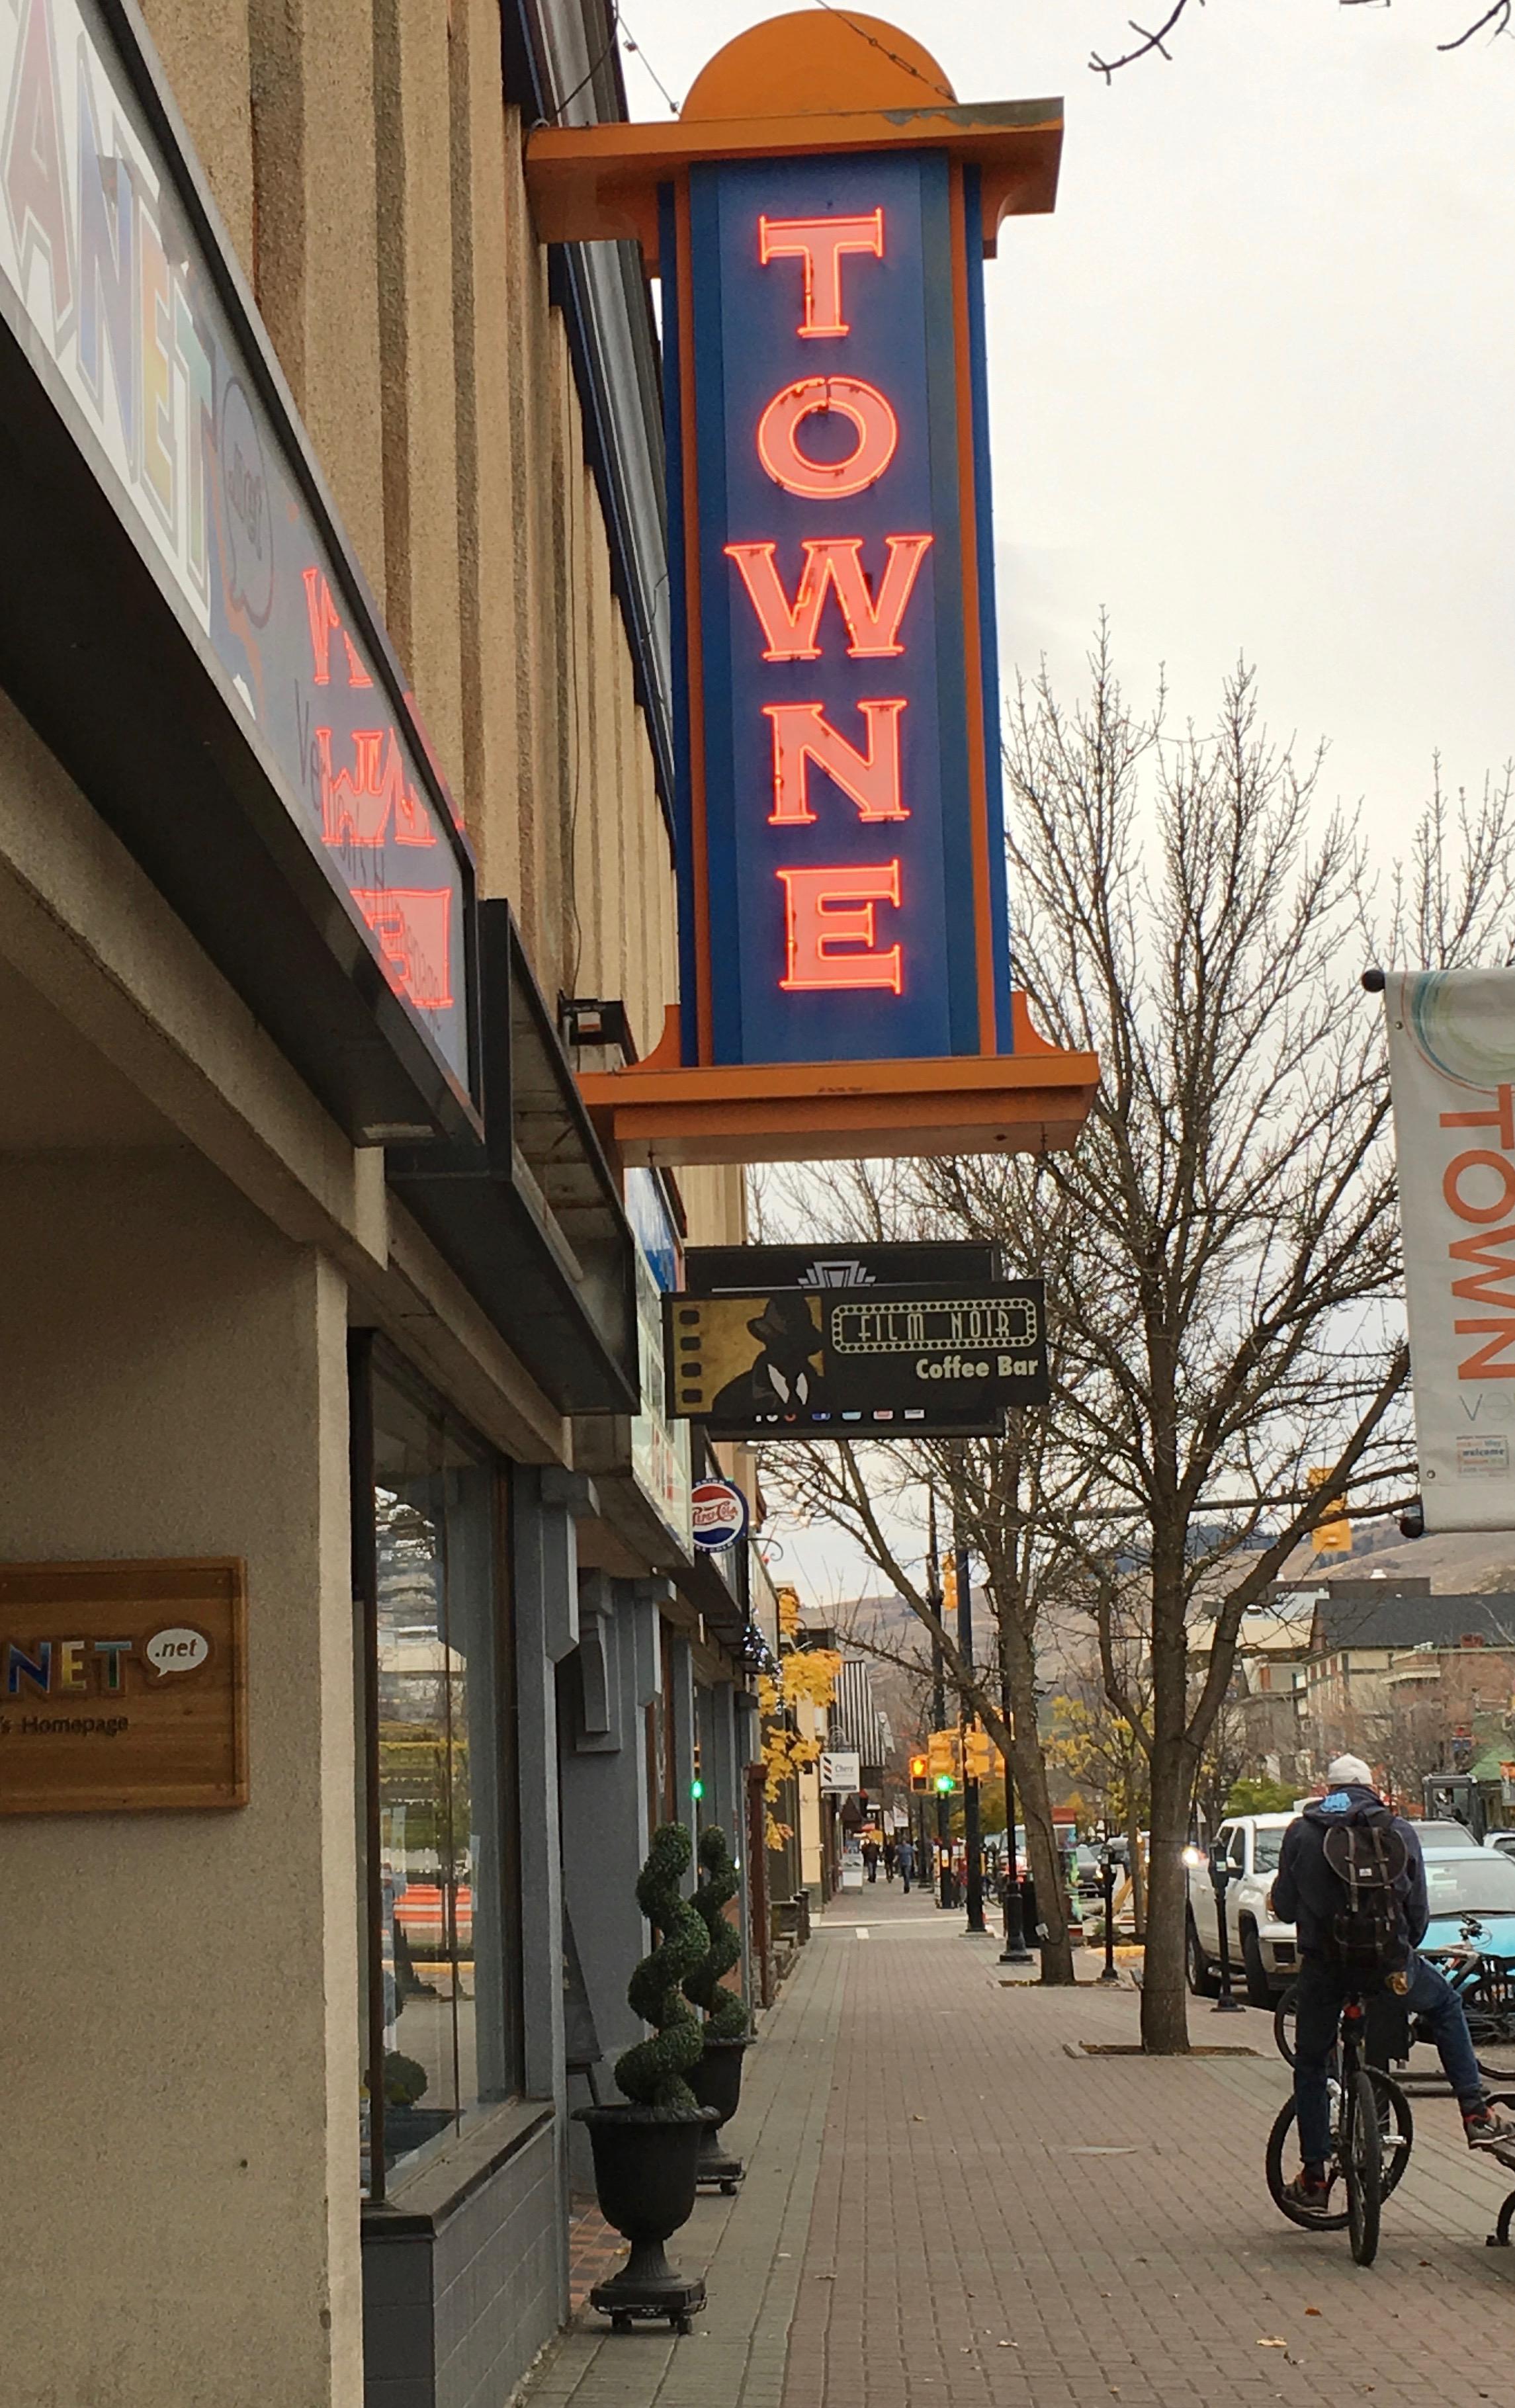 The Towne Cinema